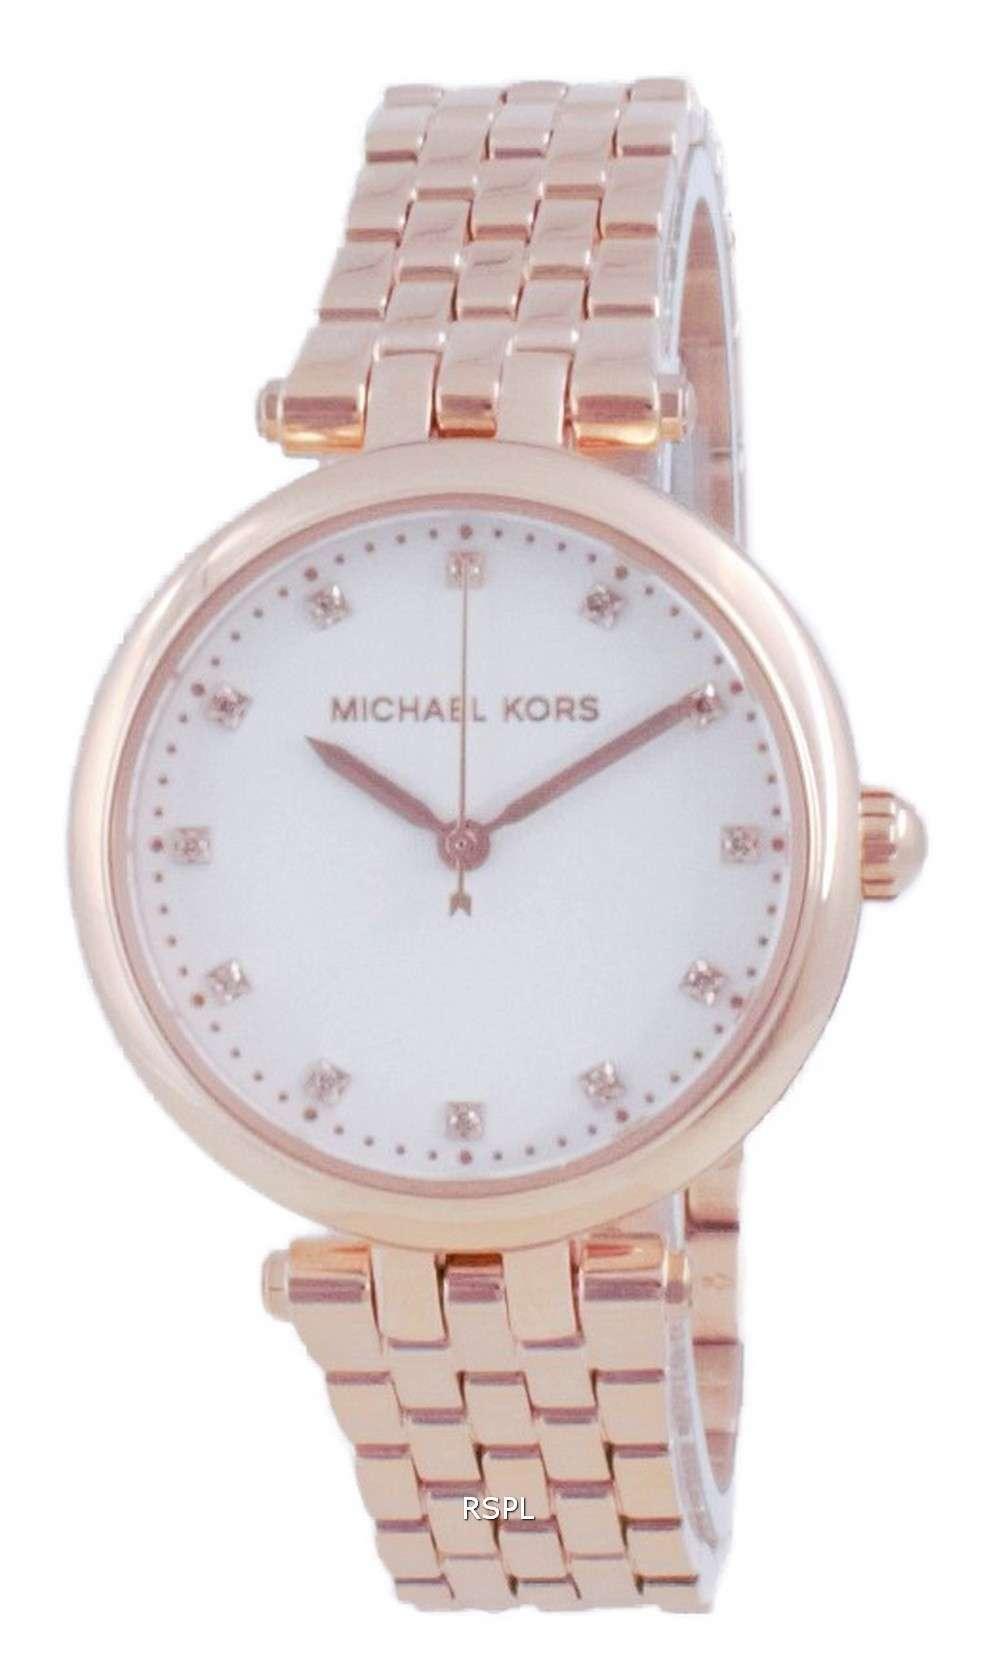 Michael Kors Darci Diamond Accents Rose Gold Quartz MK4568 Reloj para mujer